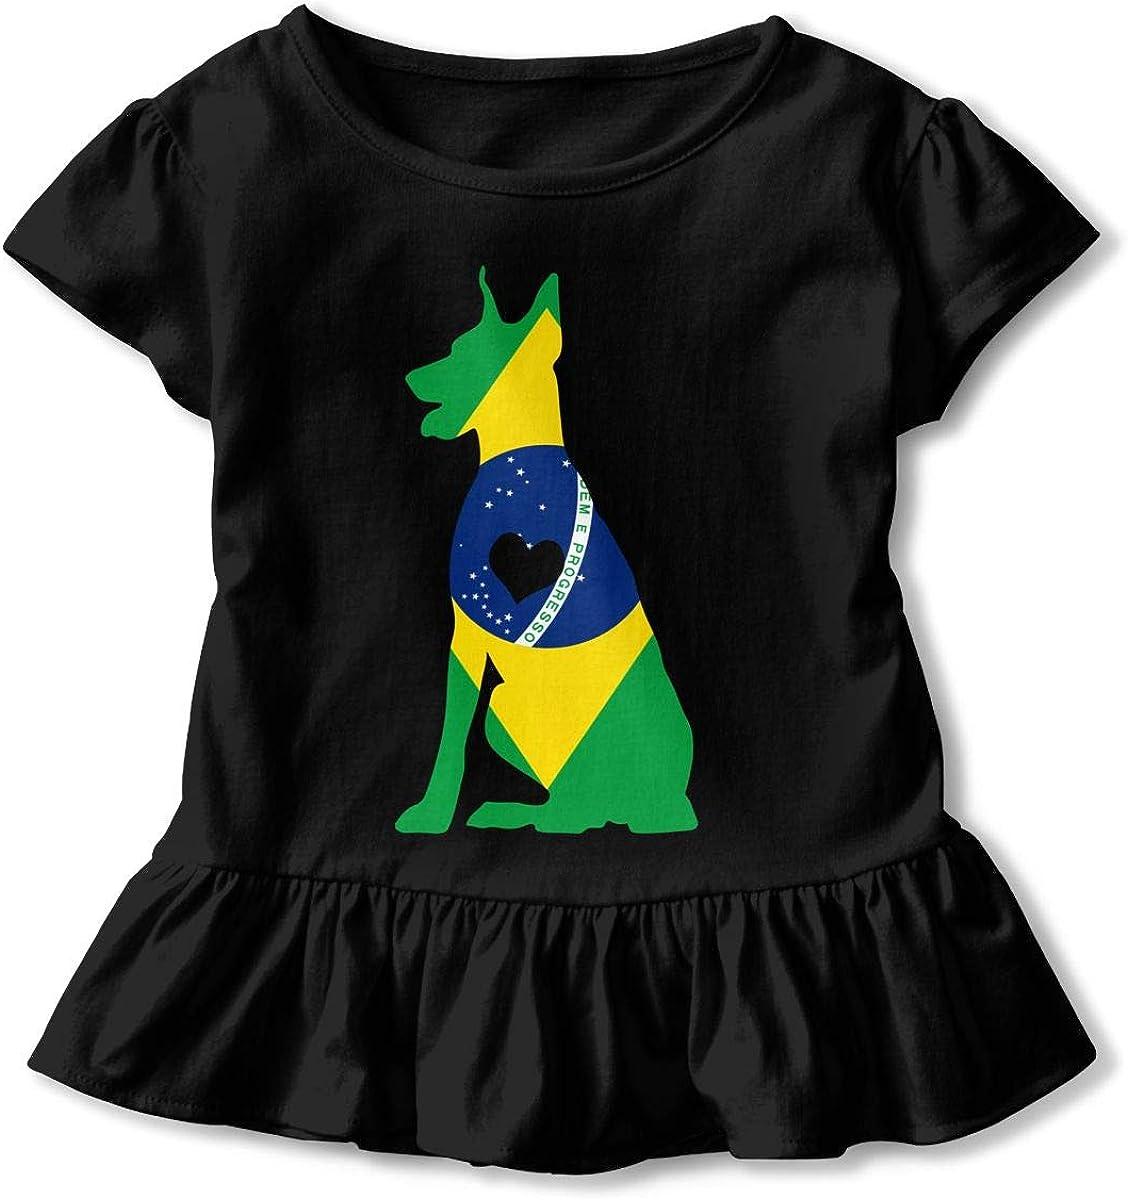 26NSHIRT Brazil Flag Adore Dobermans Dog Toddler Baby Girl Short Sleeve Fashion T-Shirts